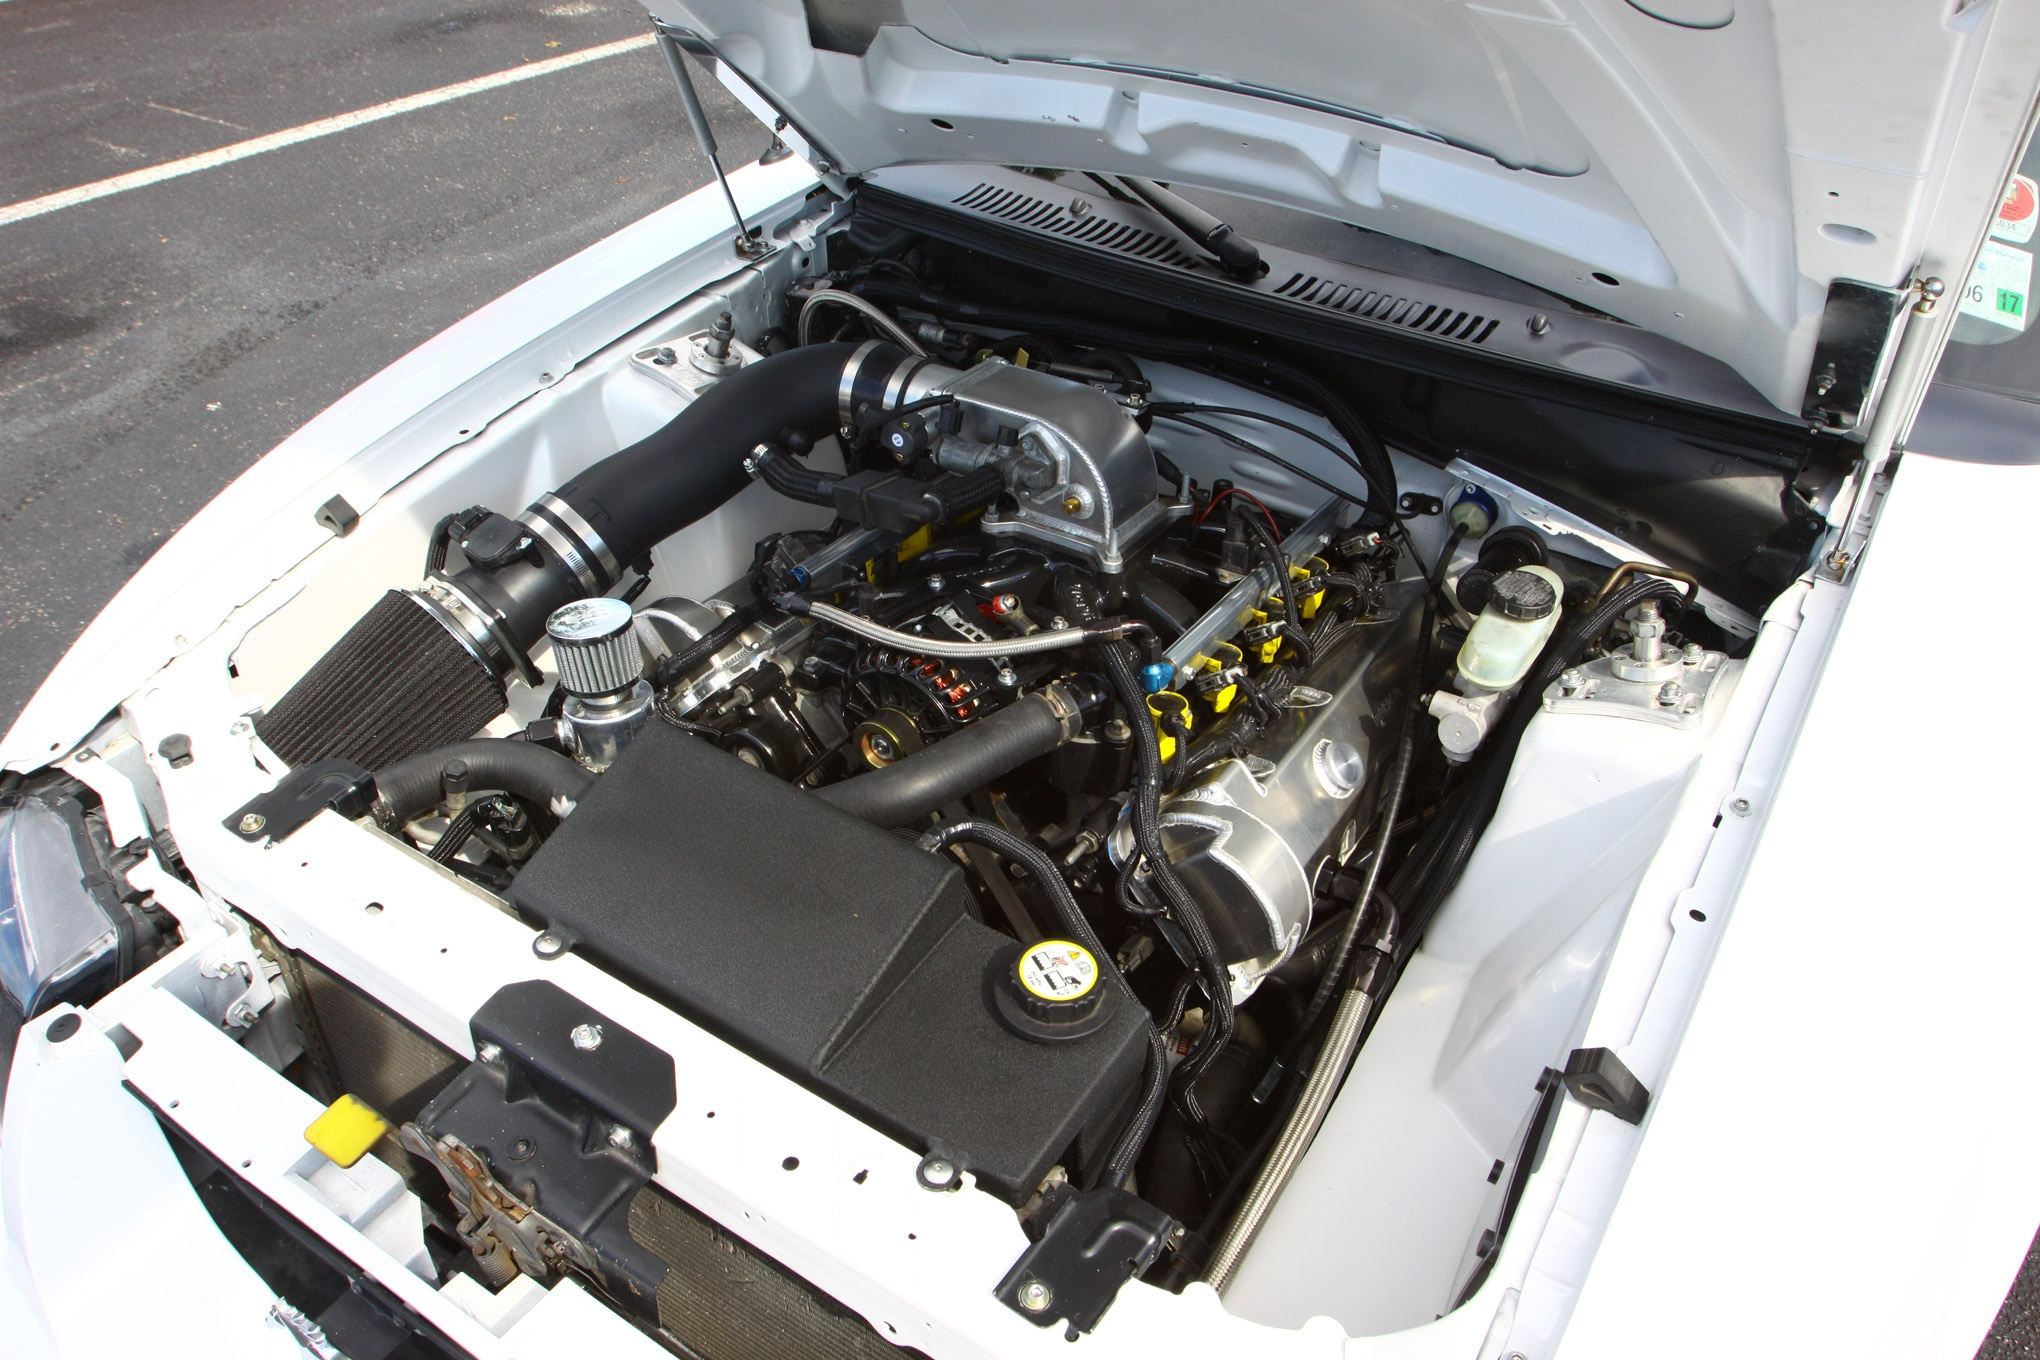 Friday CJ Pony Parts Mustang Week Car Show 85